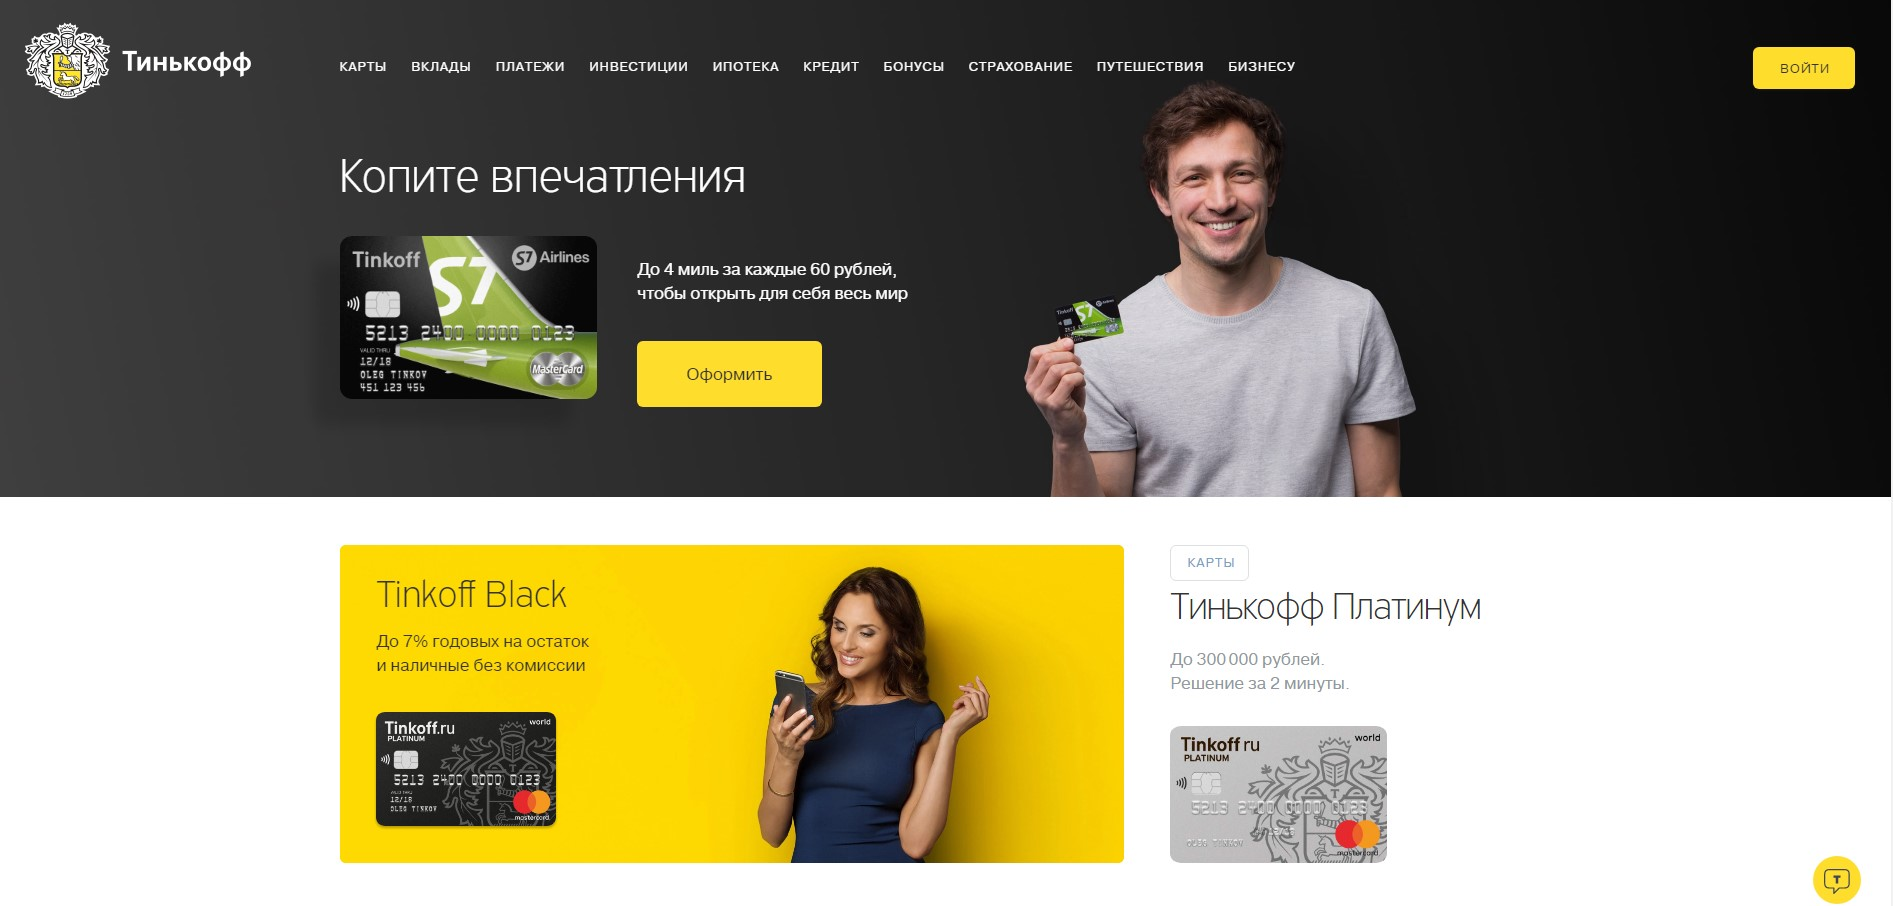 Как зайти на сайт банка Тинькофф